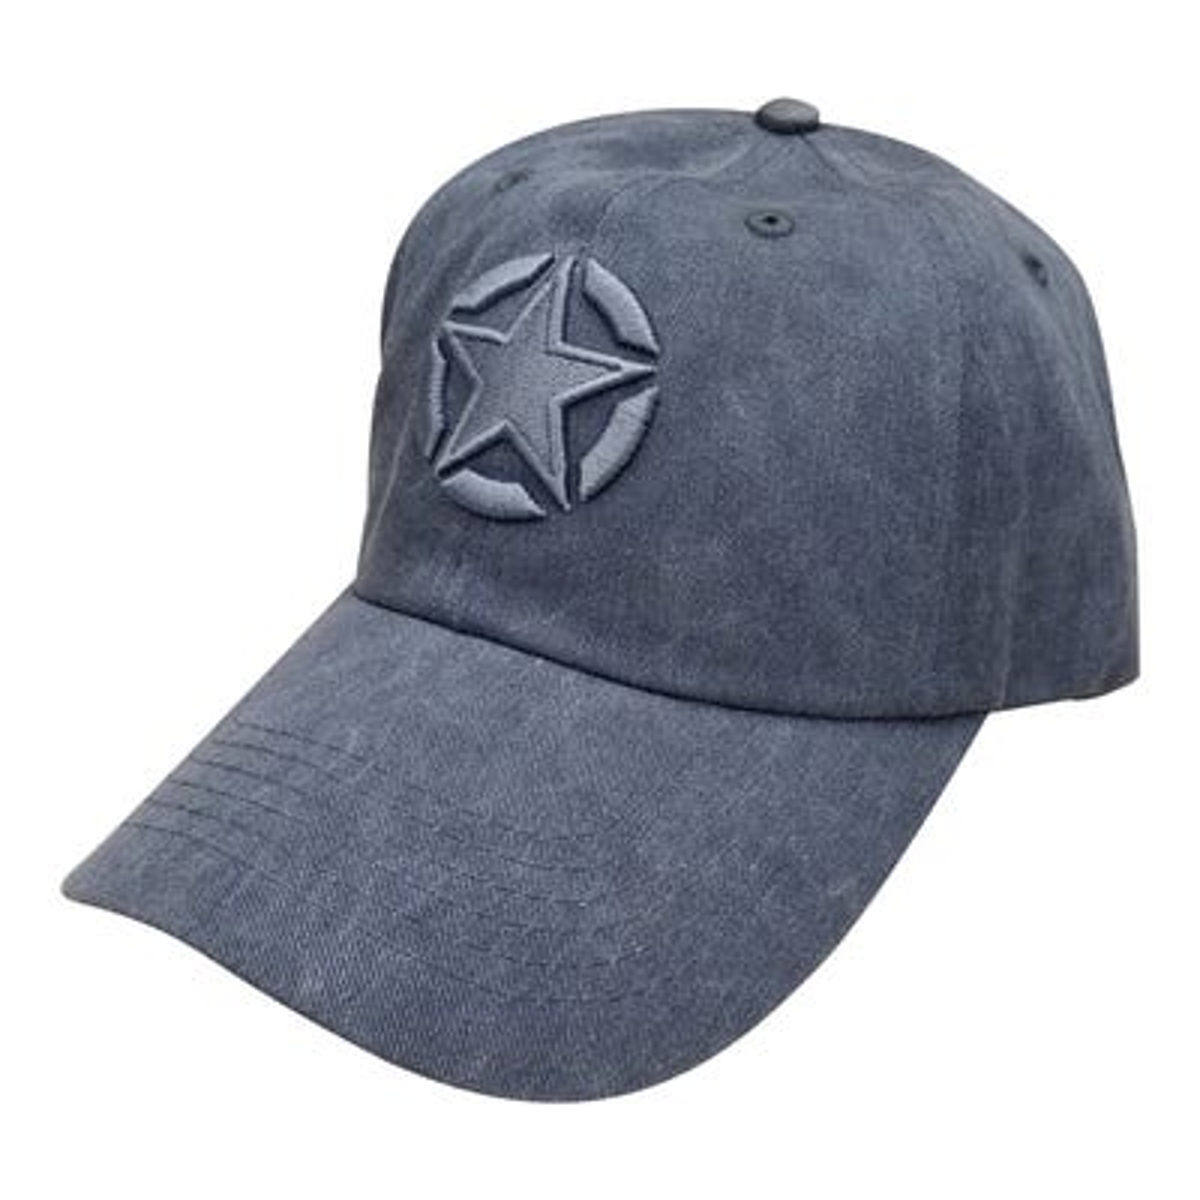 Washed Navy Dad Cap